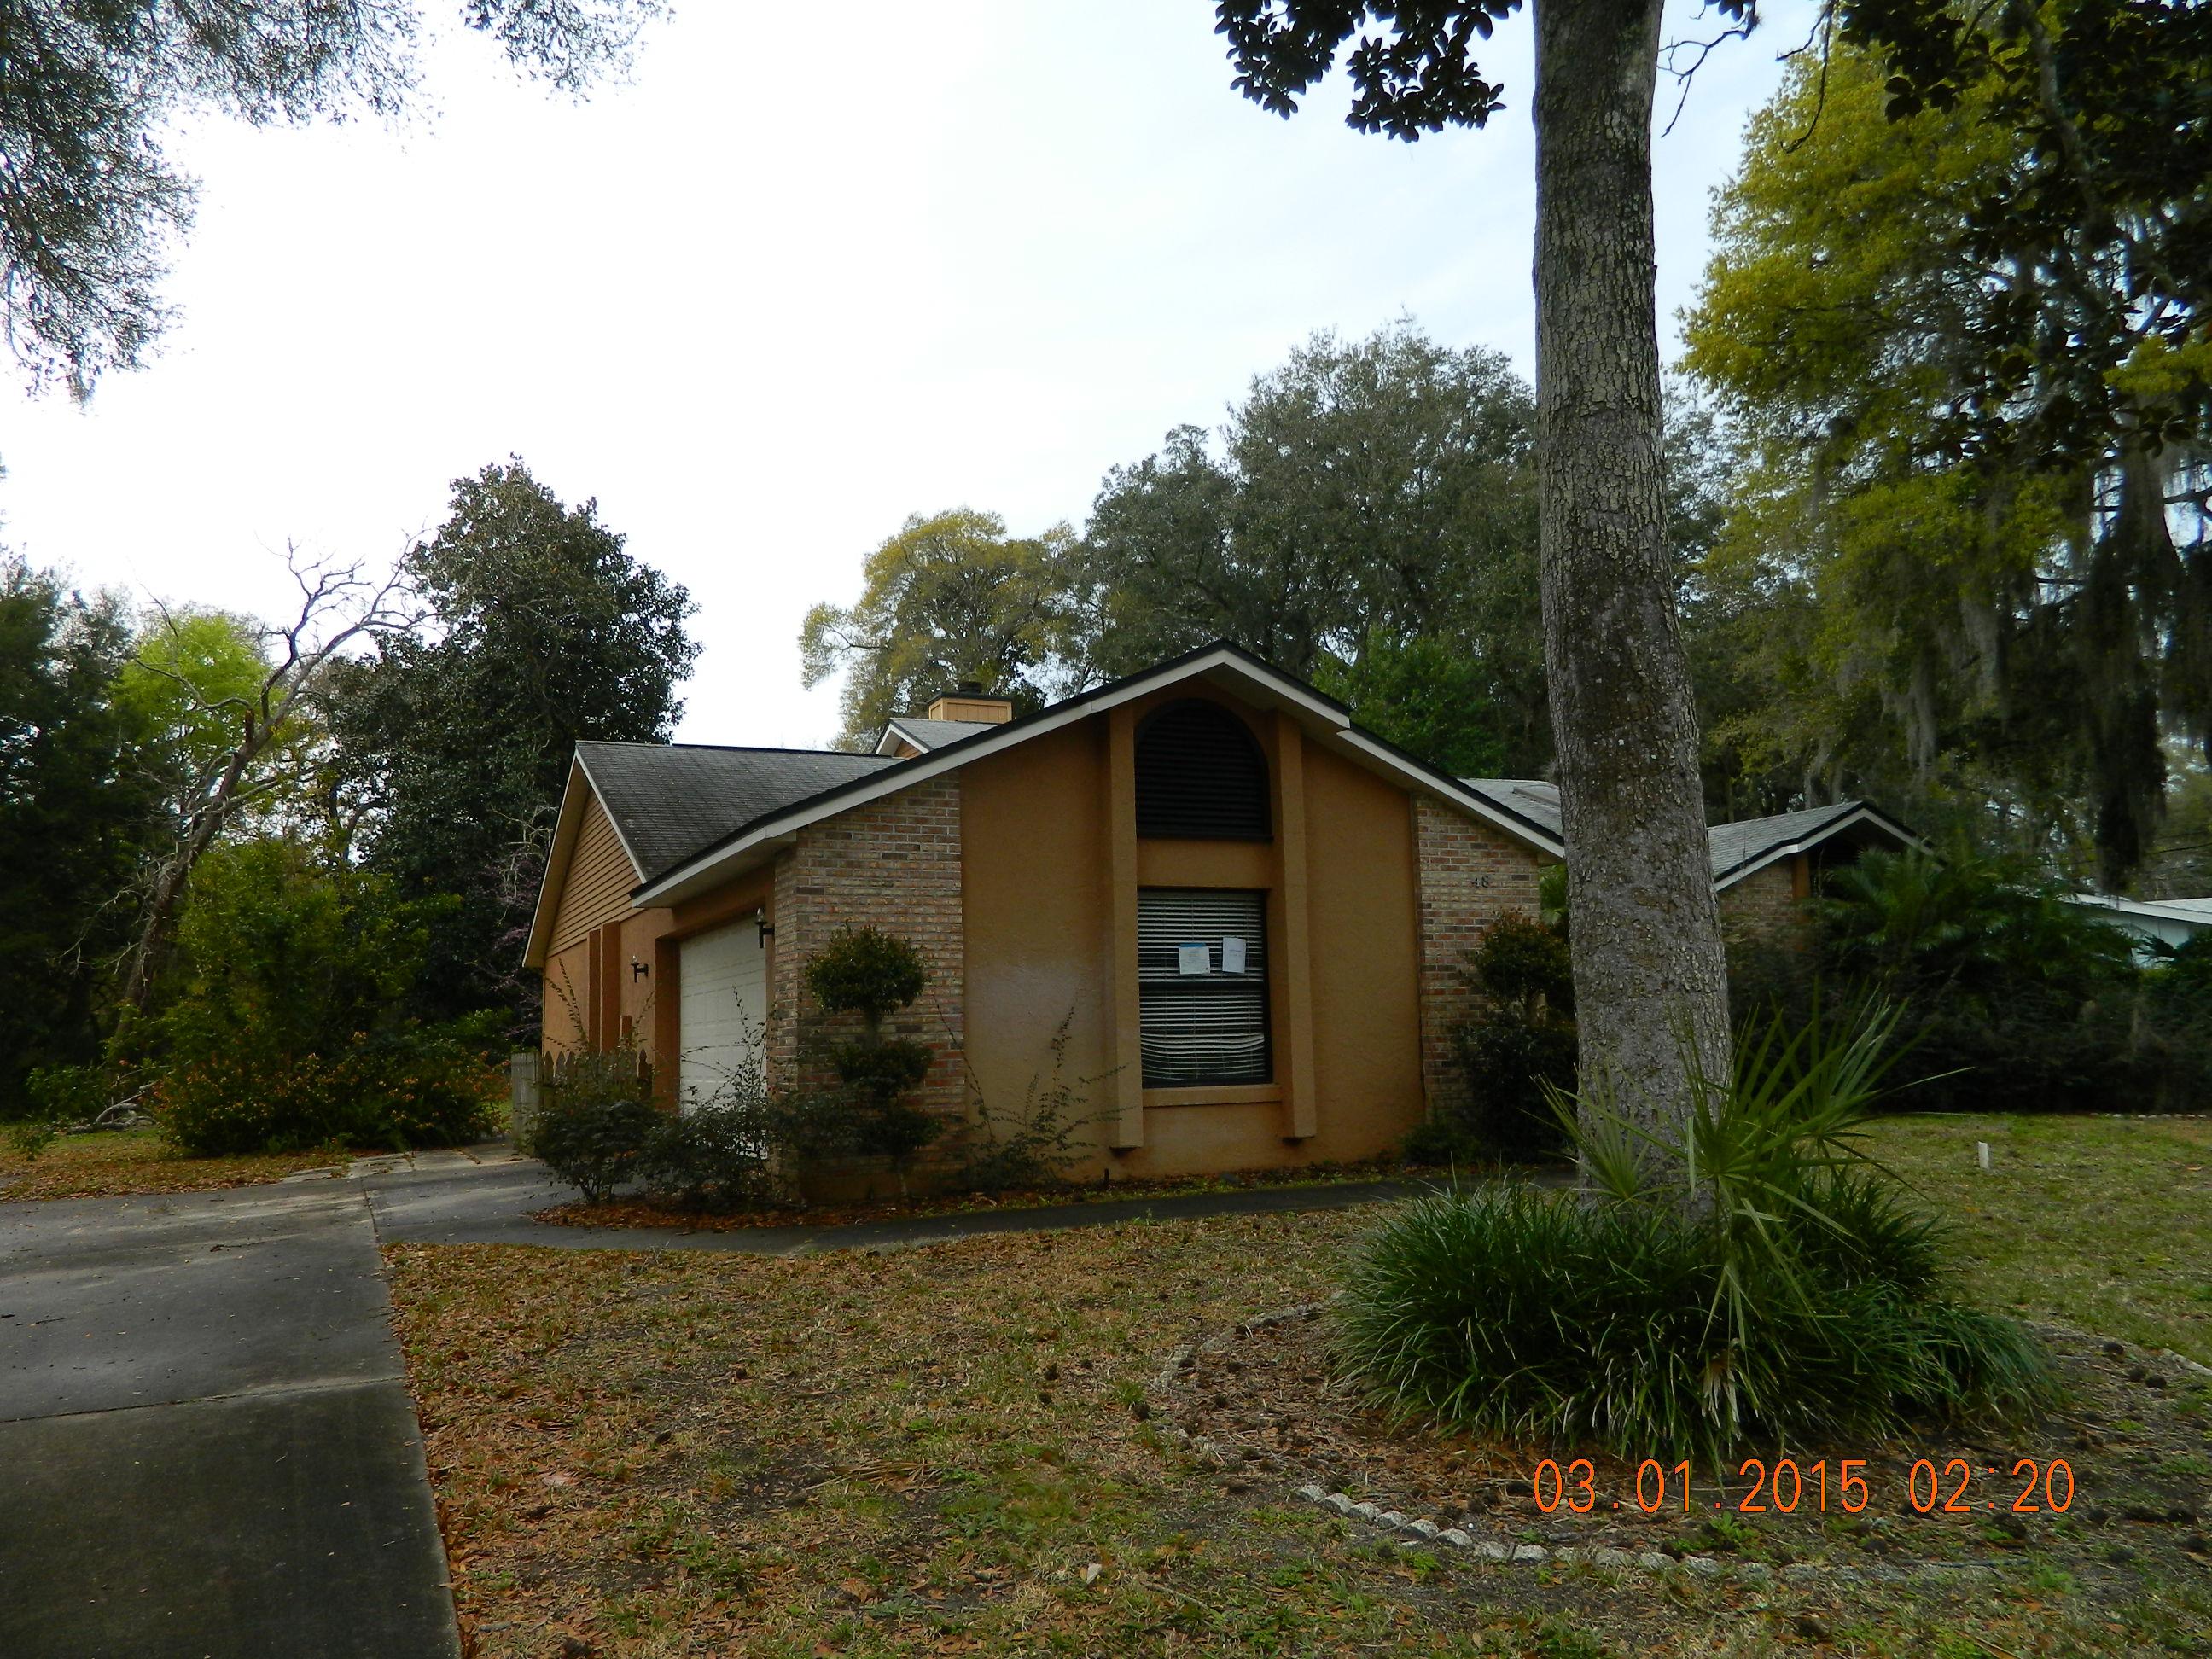 48 N Saint Andrews Dr, Ormond Beach, FL 32174